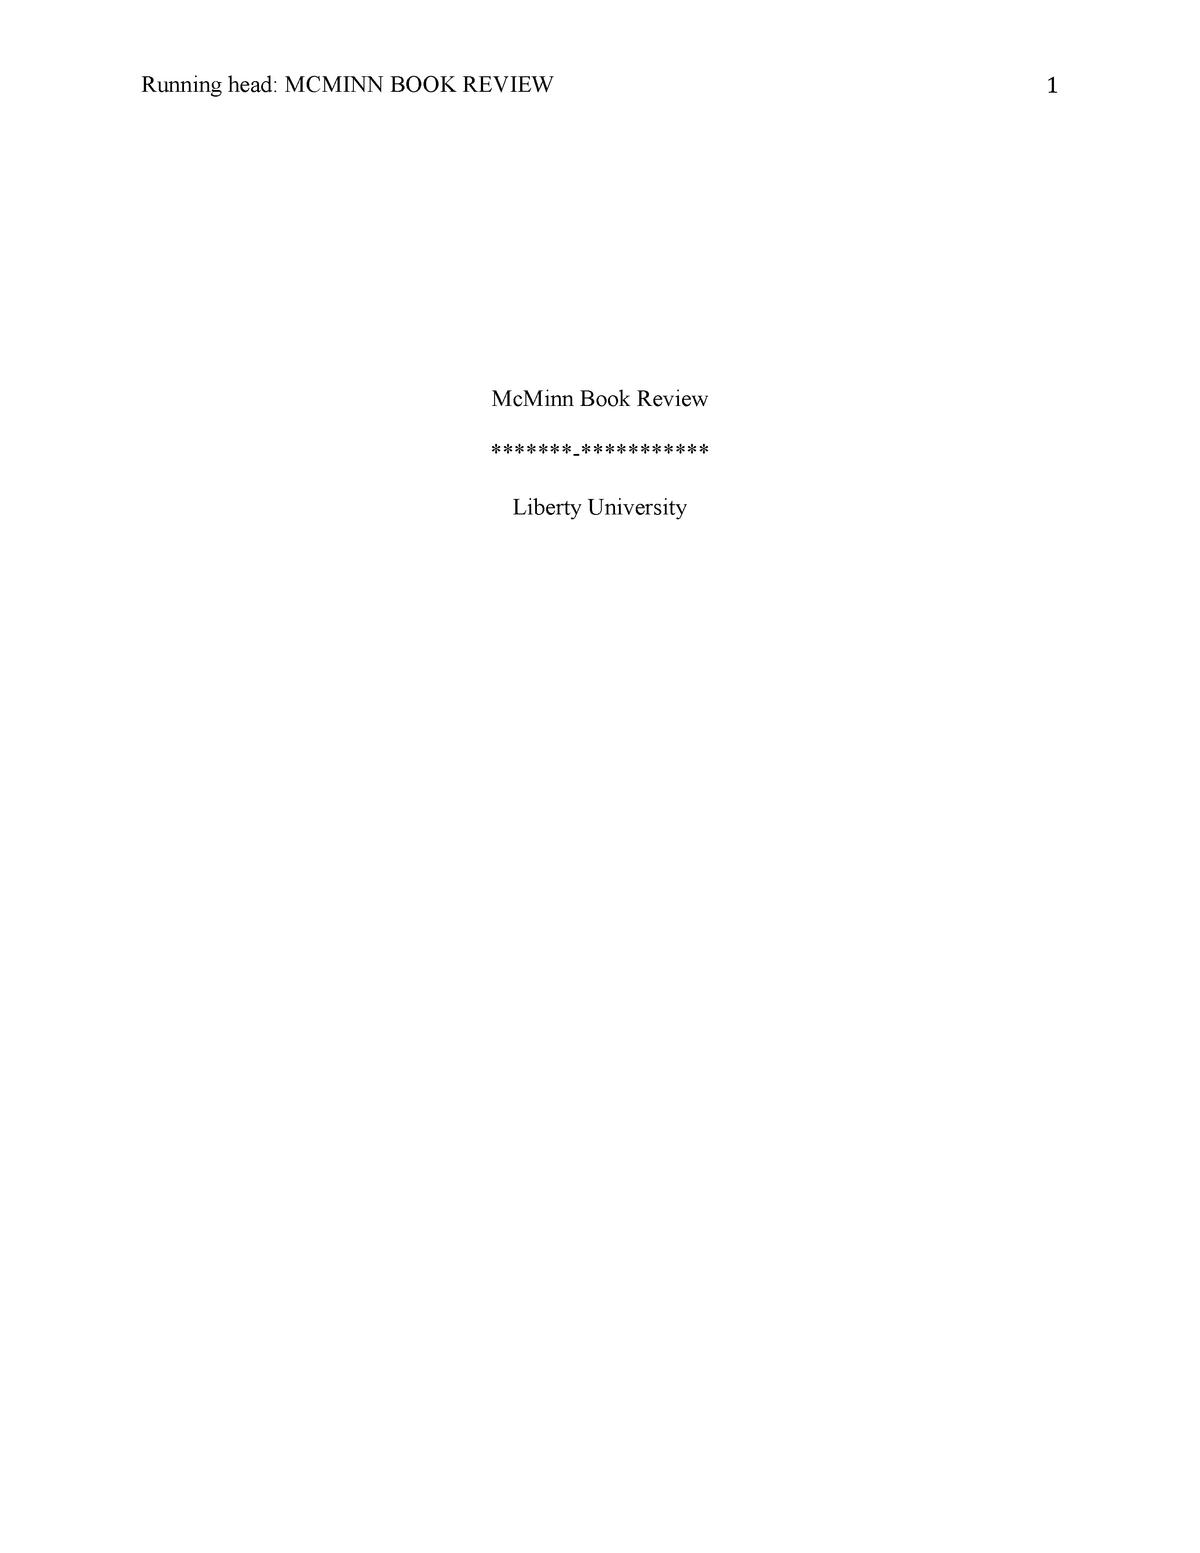 Gerard manley hopkins essay